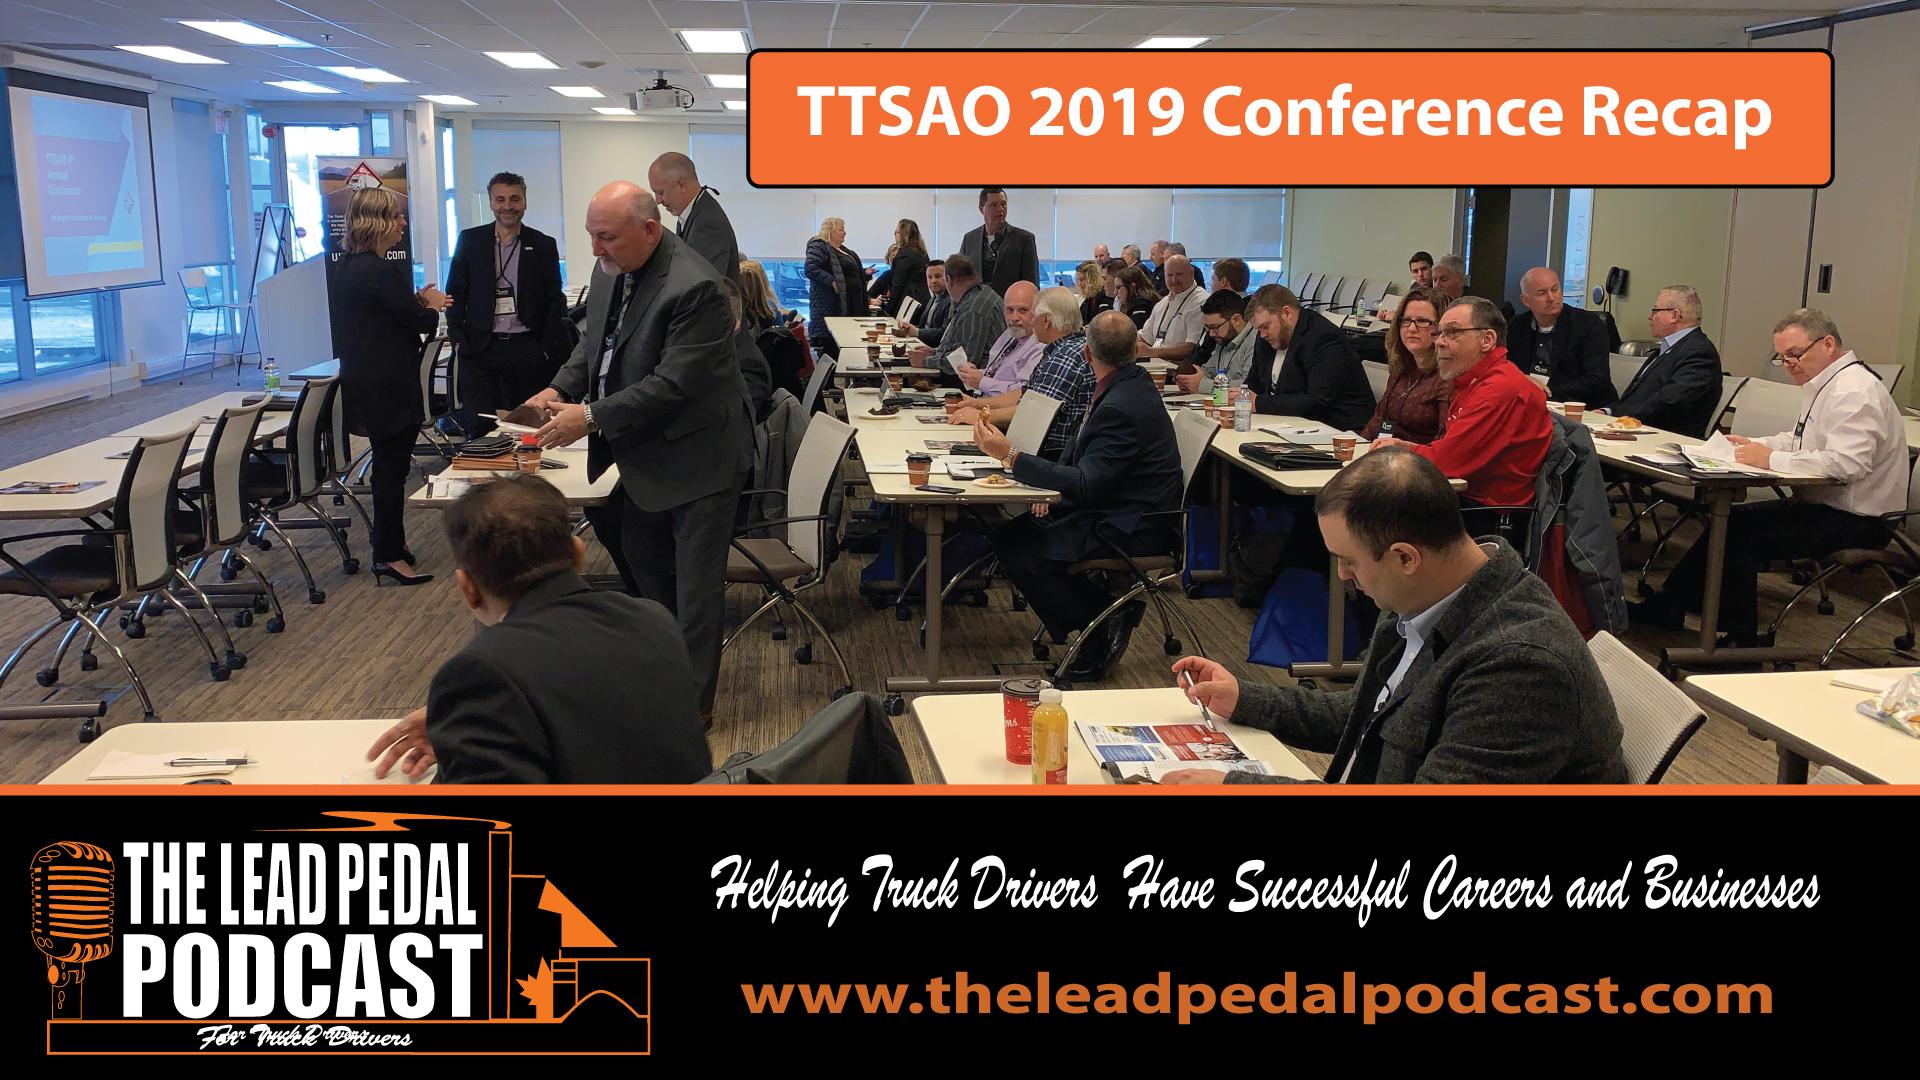 TTSAO Conference 2019